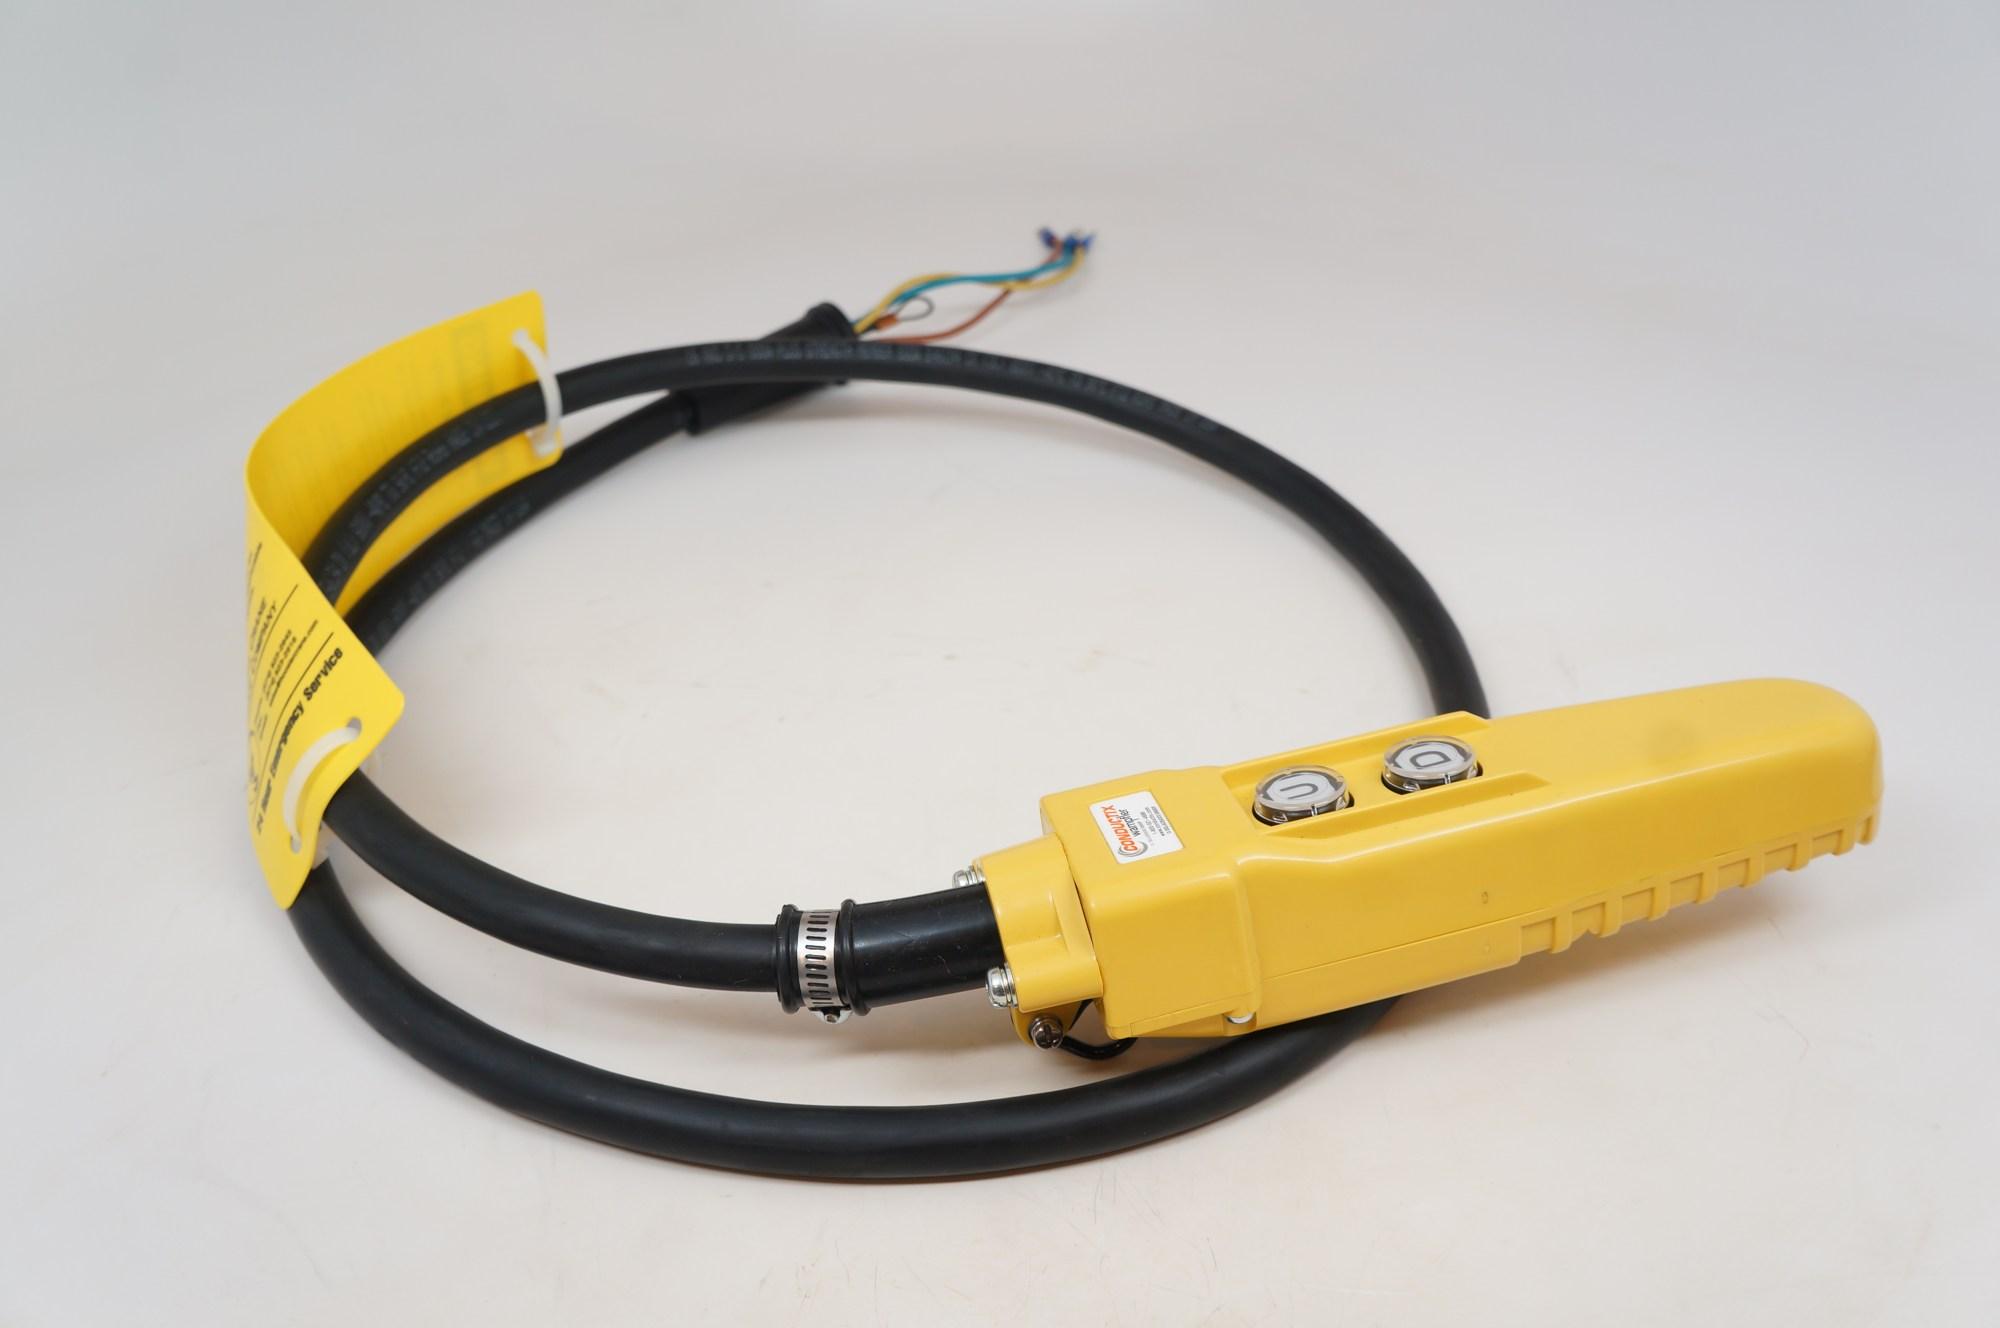 hight resolution of 6 ft pendant control station for cm chain hoist 6 cord jibcranes com 1 jib crane supplier